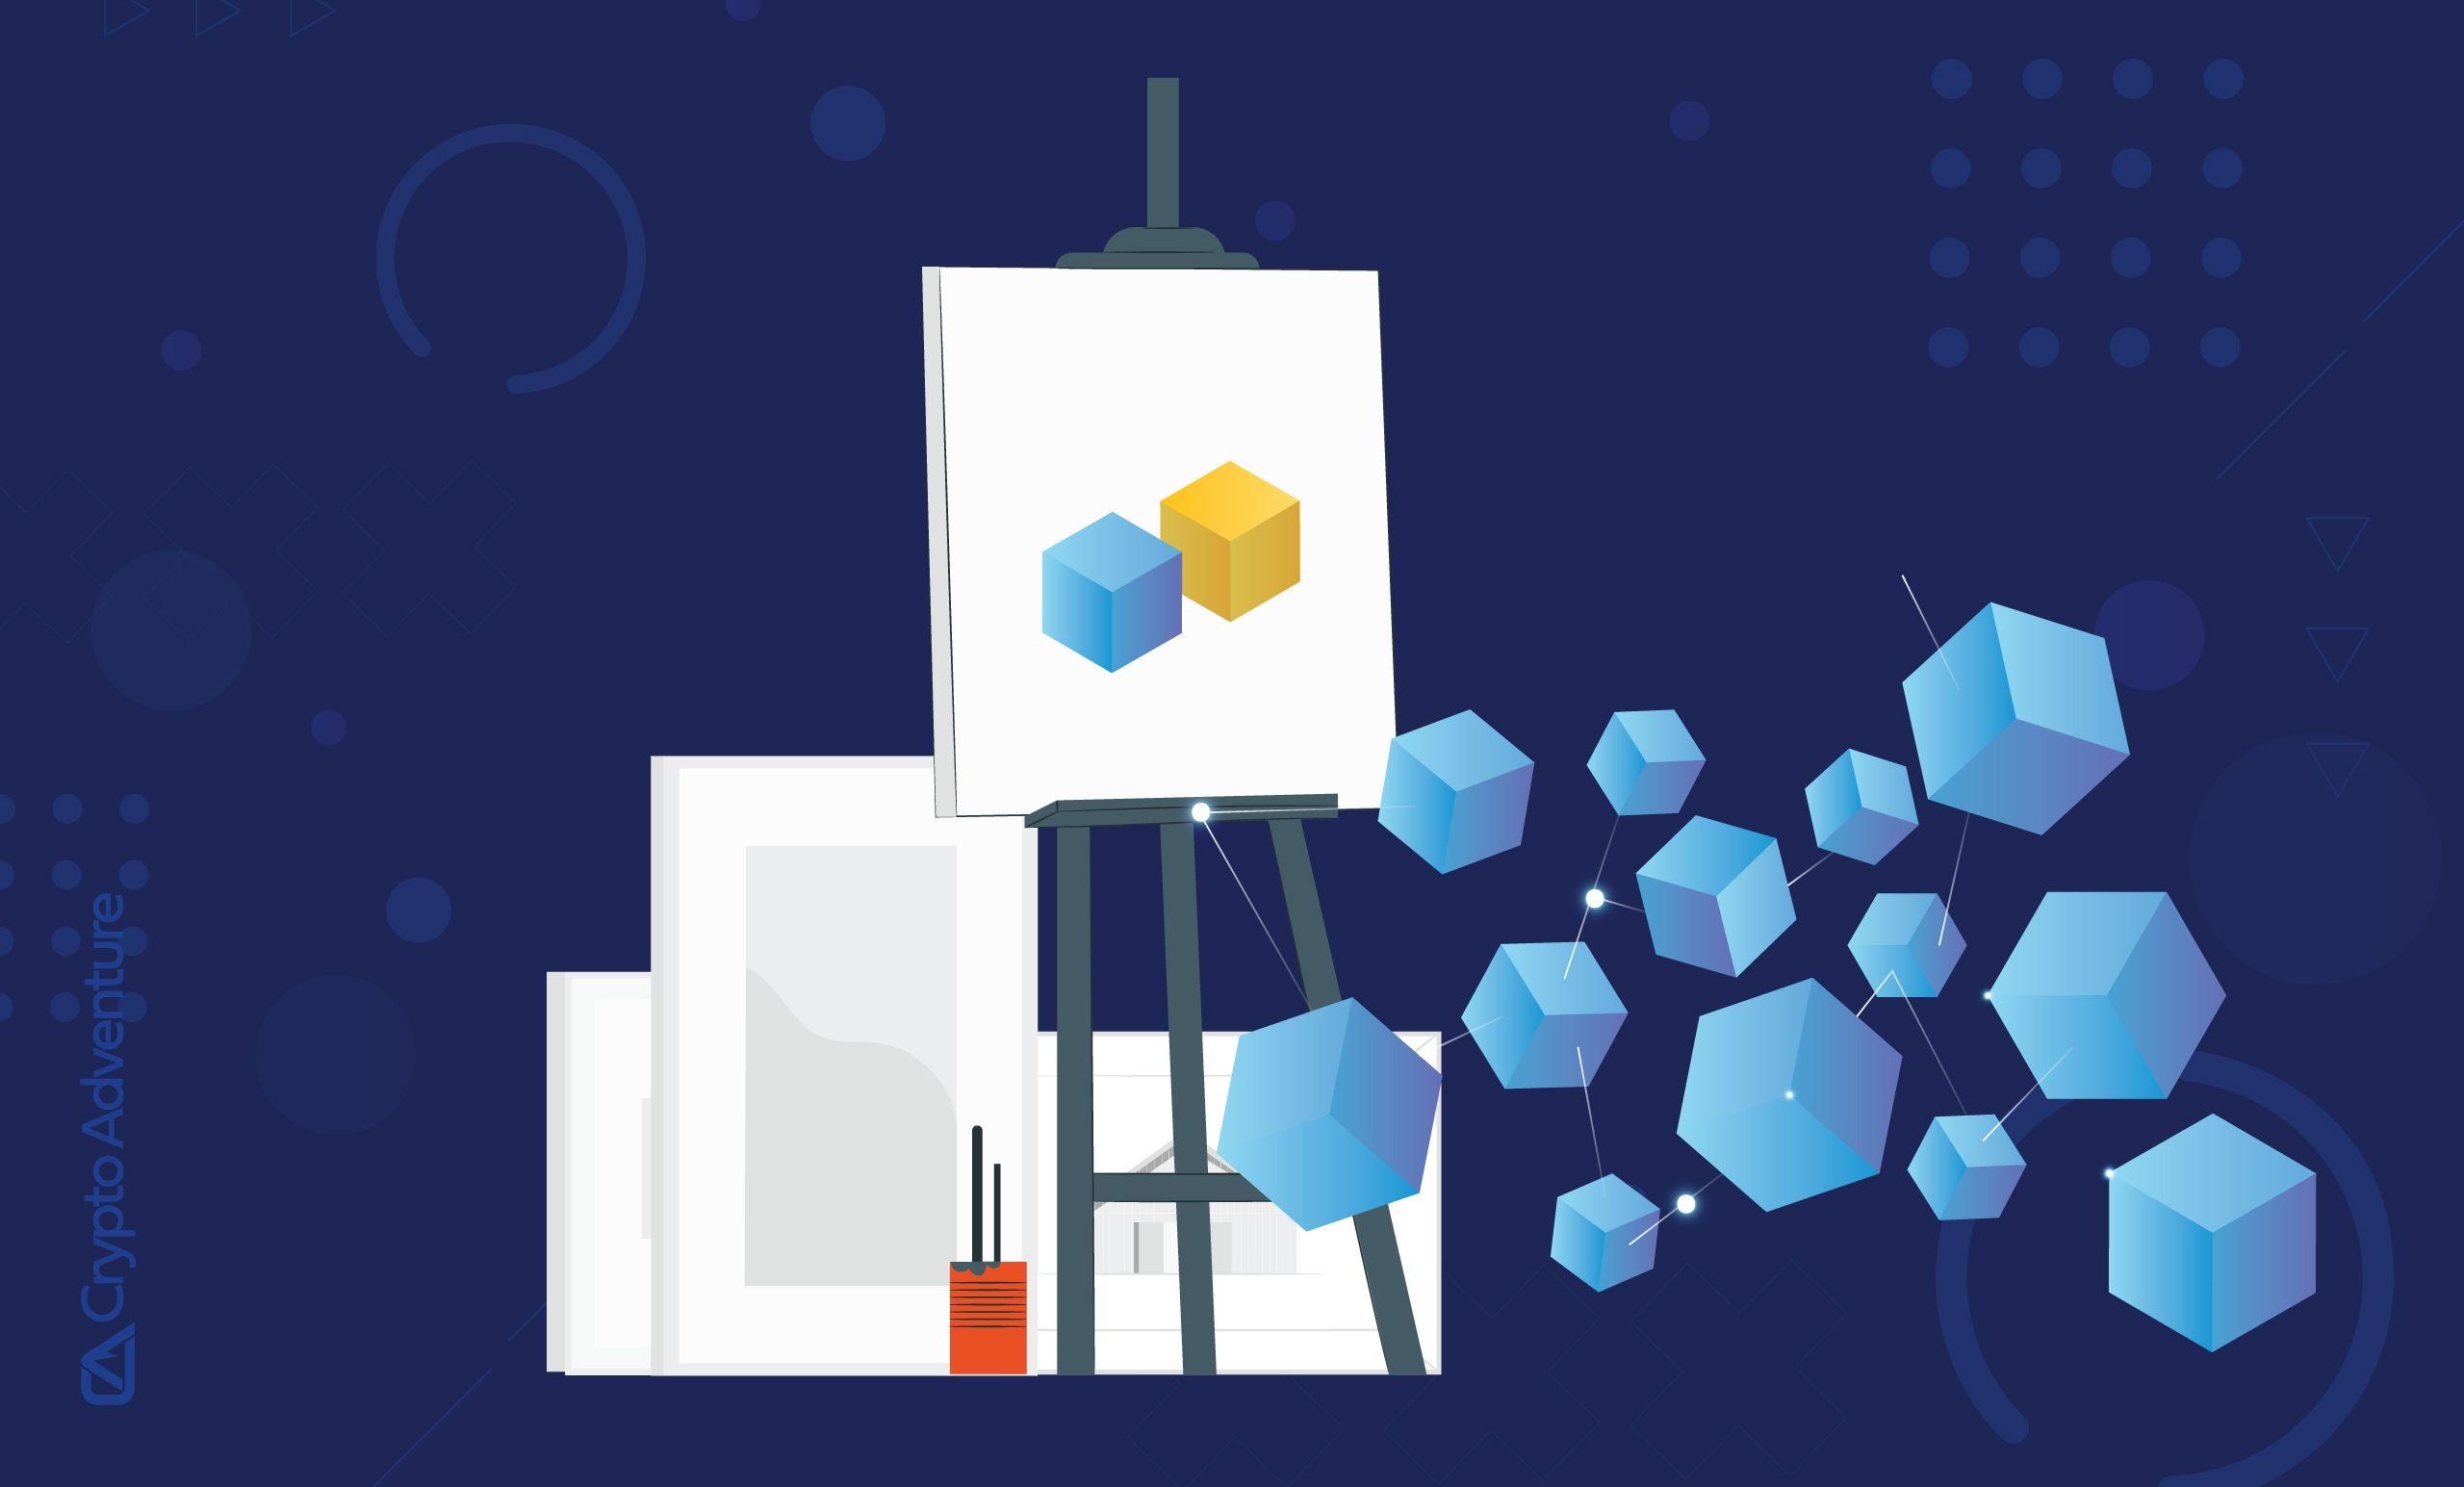 /blockchain-art-crypto-art-an-analysis-0x2534cc feature image